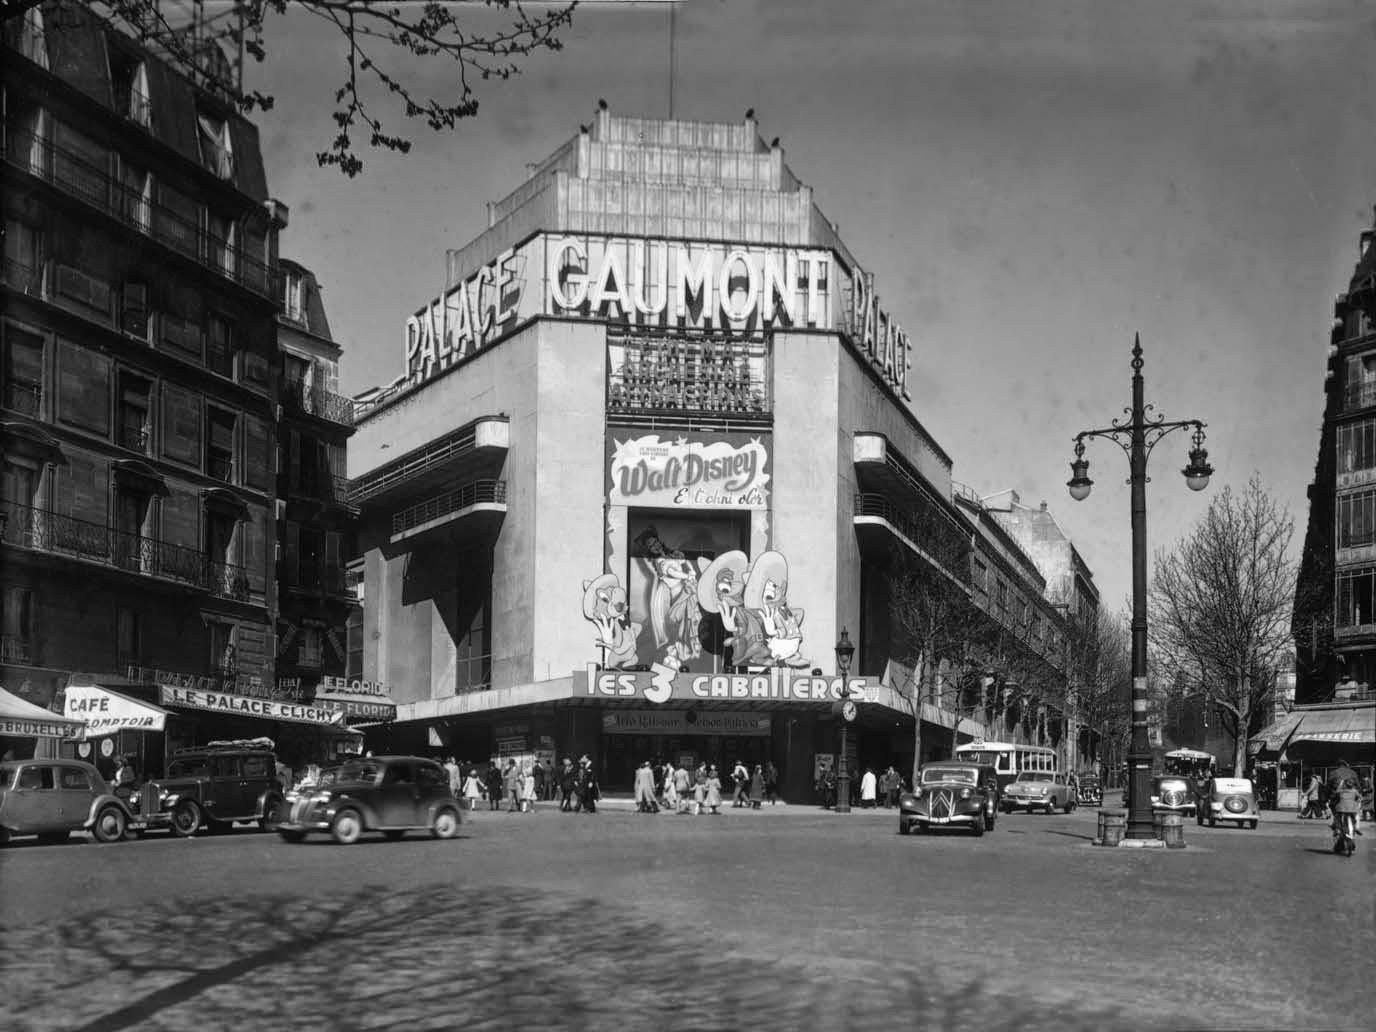 Le blog de zazie: ciné balade truffaut